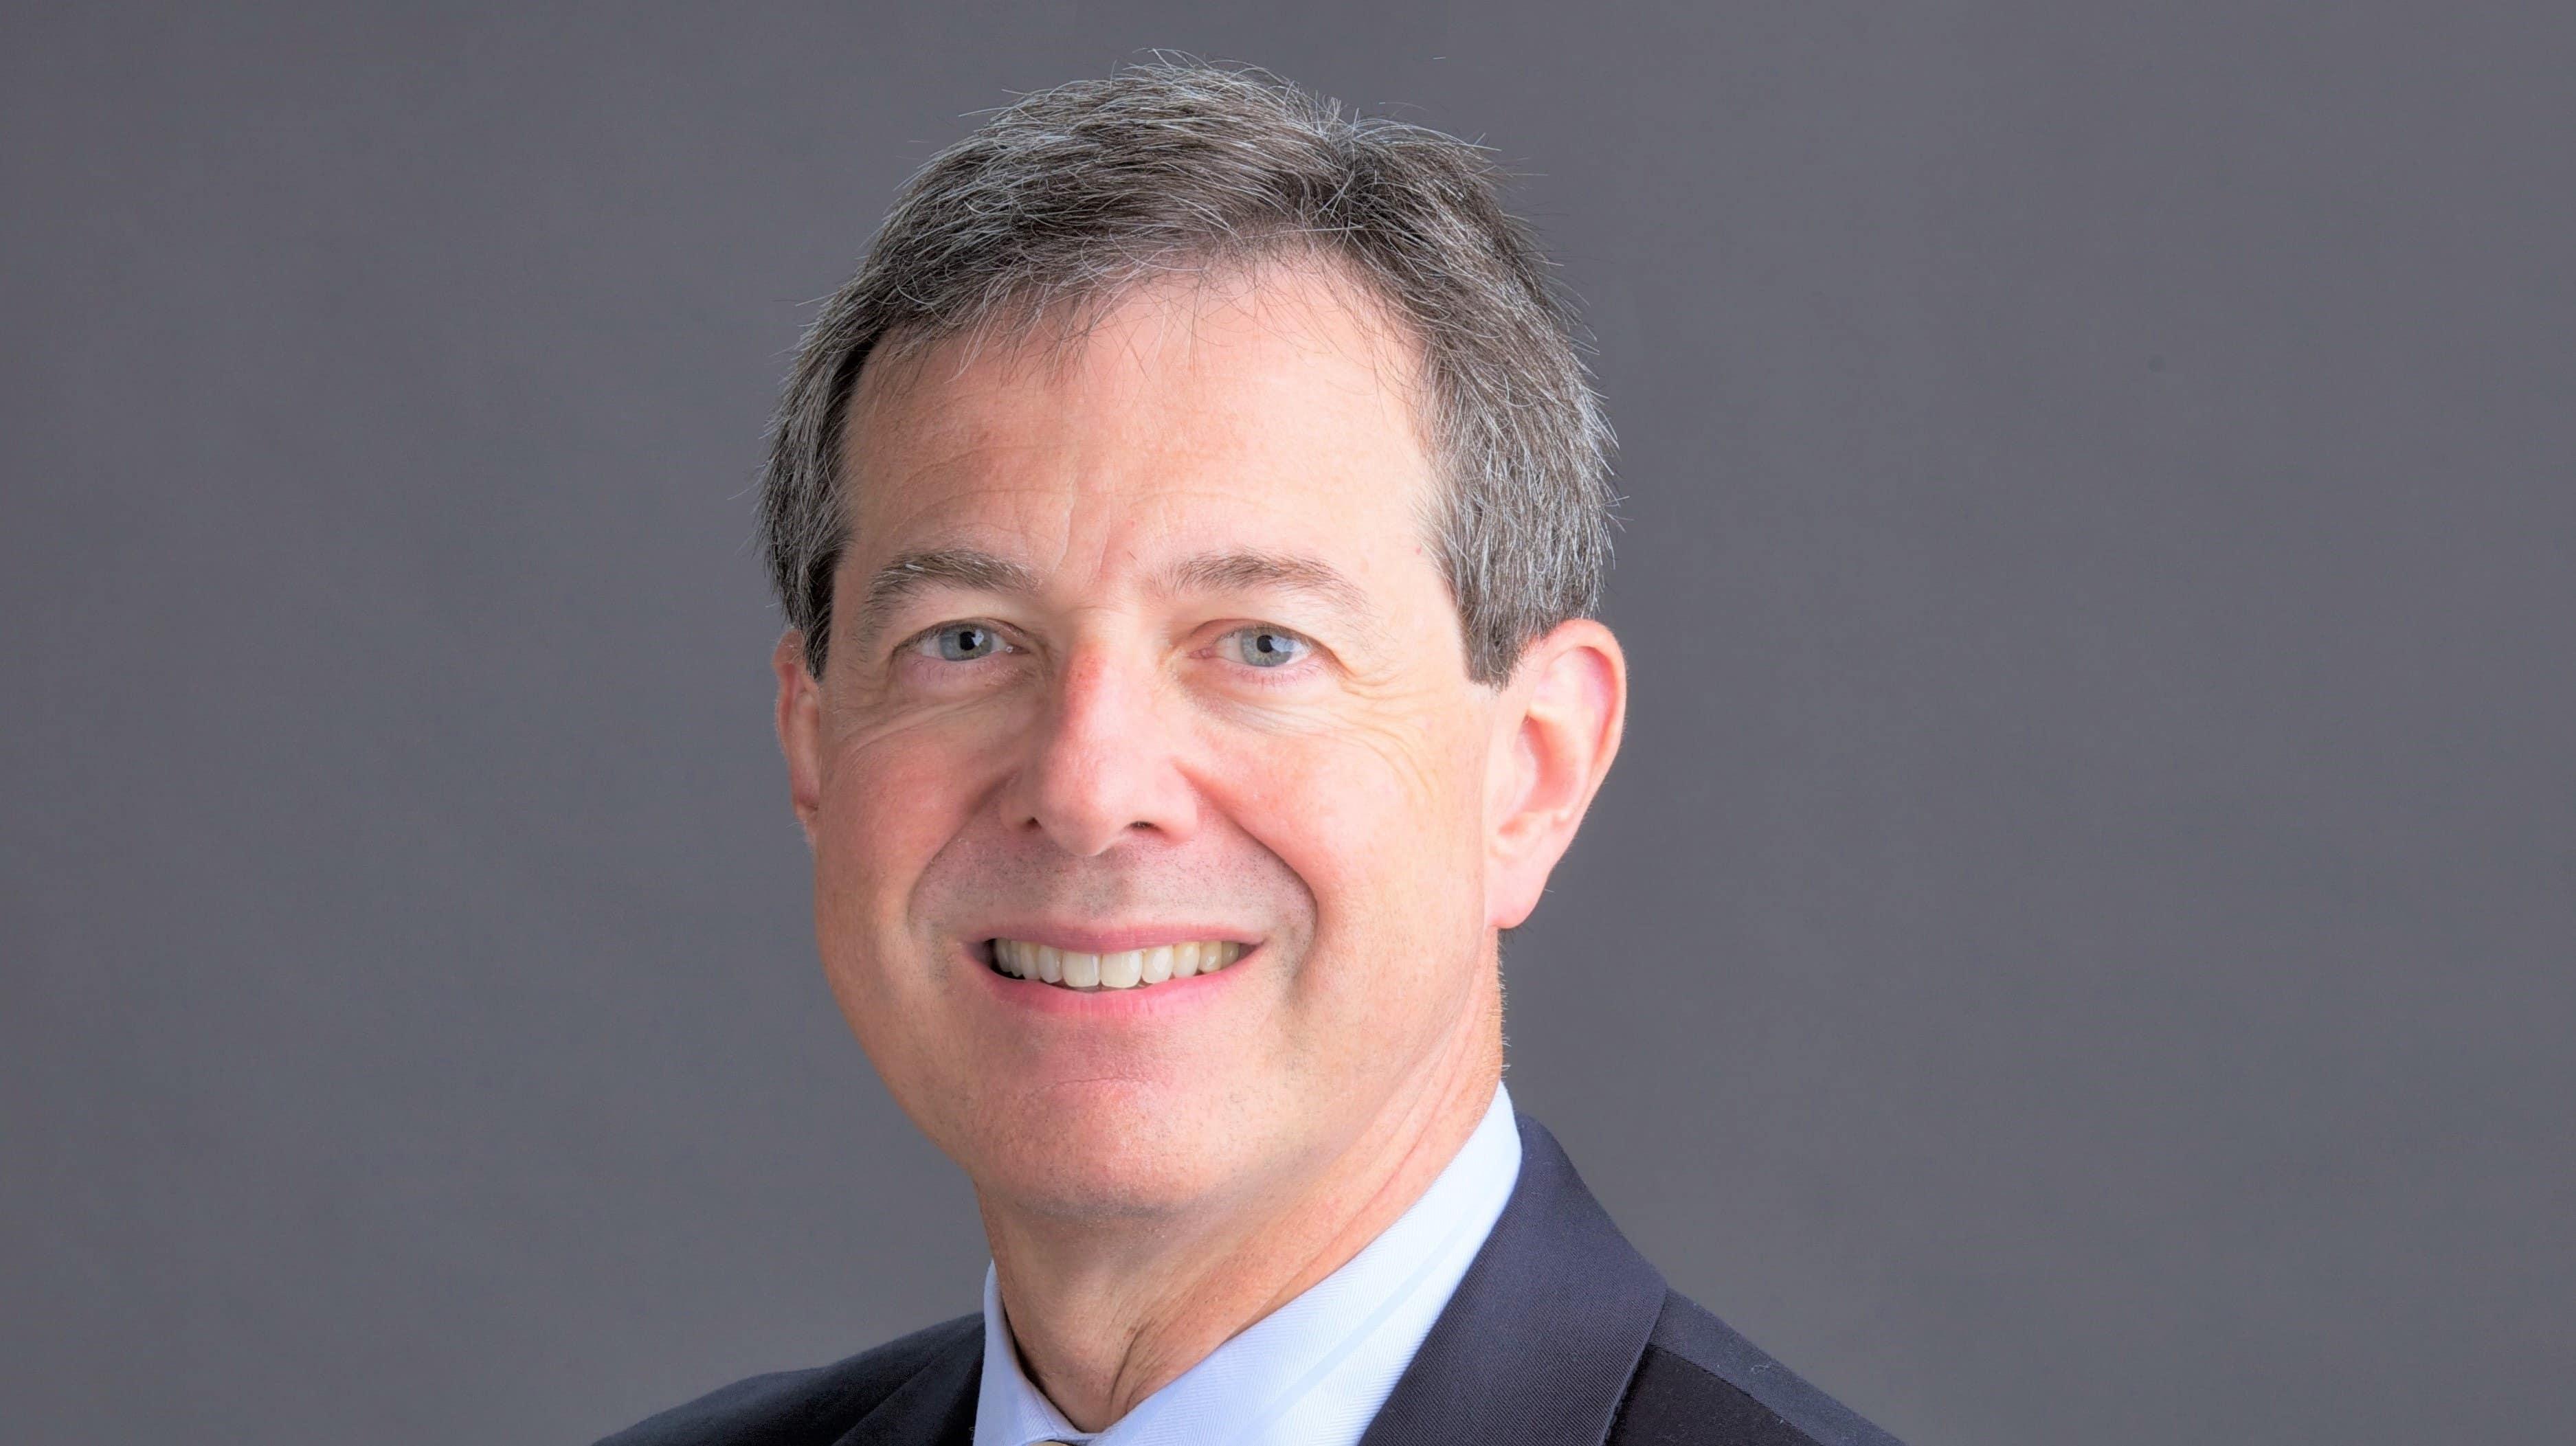 John Hubbard, Ph.D., Joins Science 37® Board of Directors